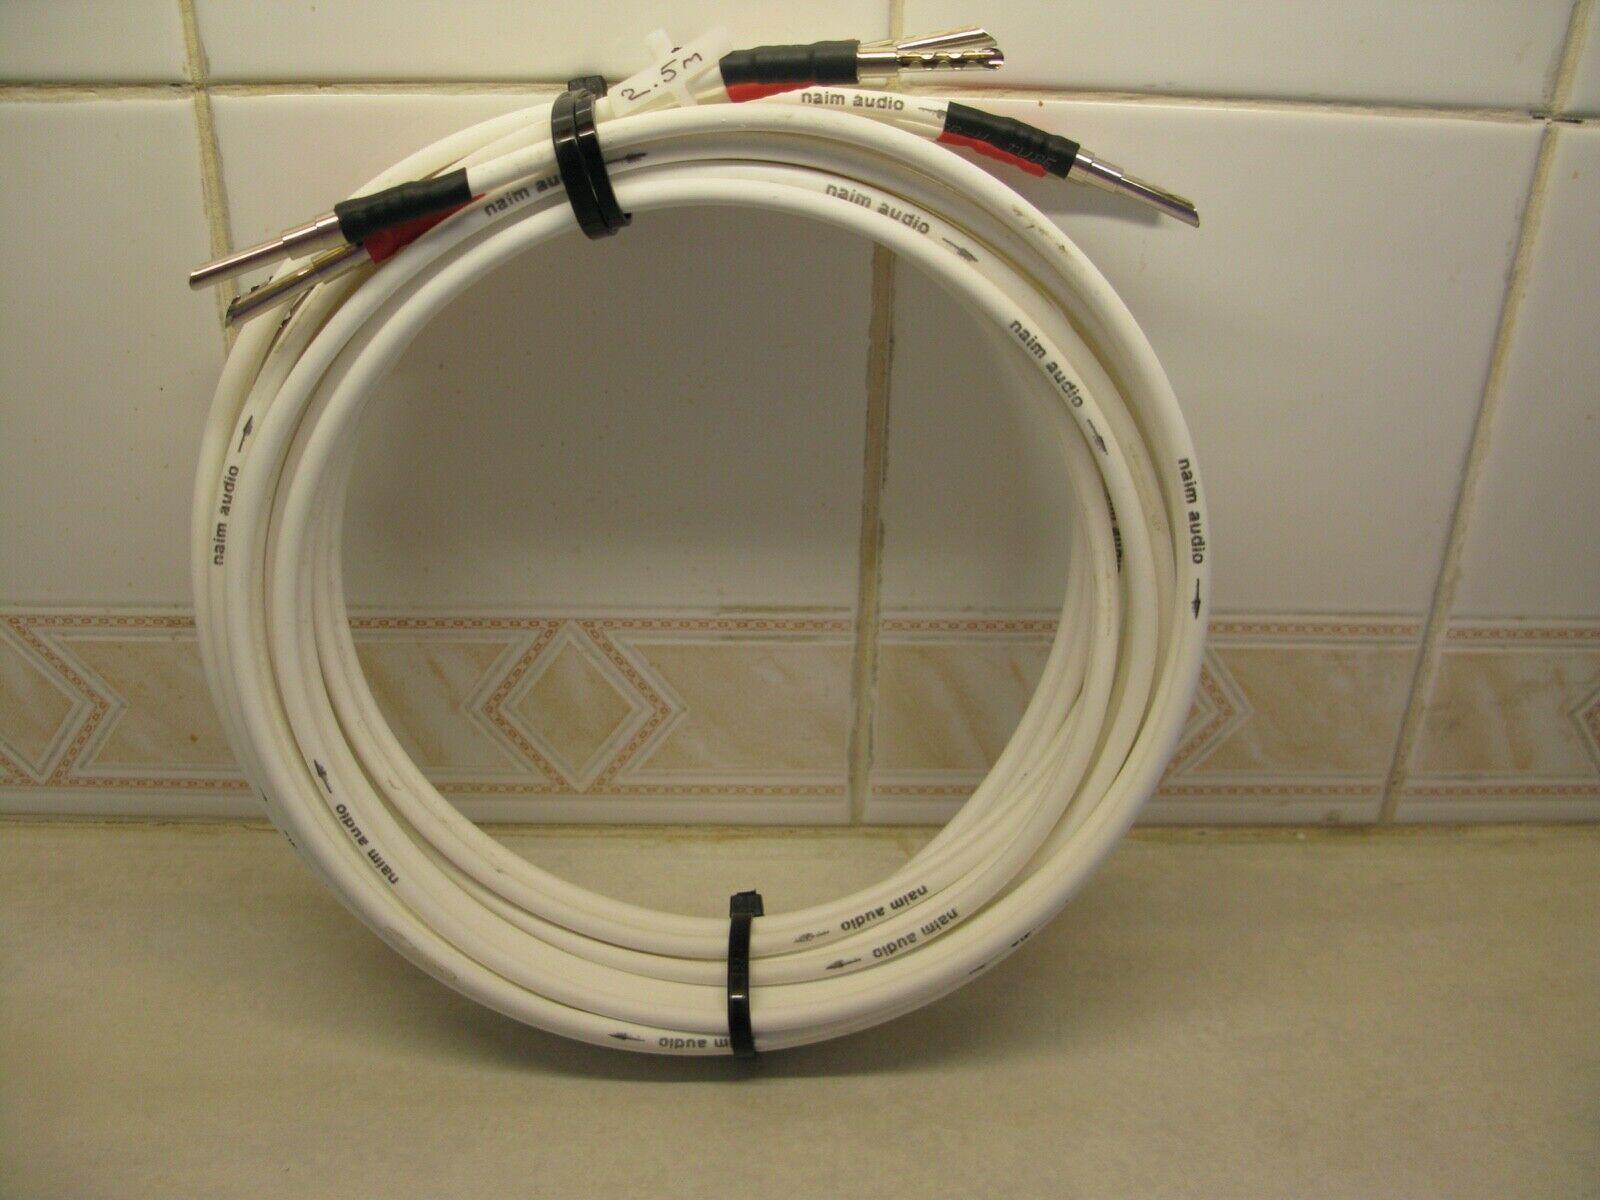 Naim NAC A5 Speaker Cable, 2.5m Pair, Banana Plug - Banana Plug